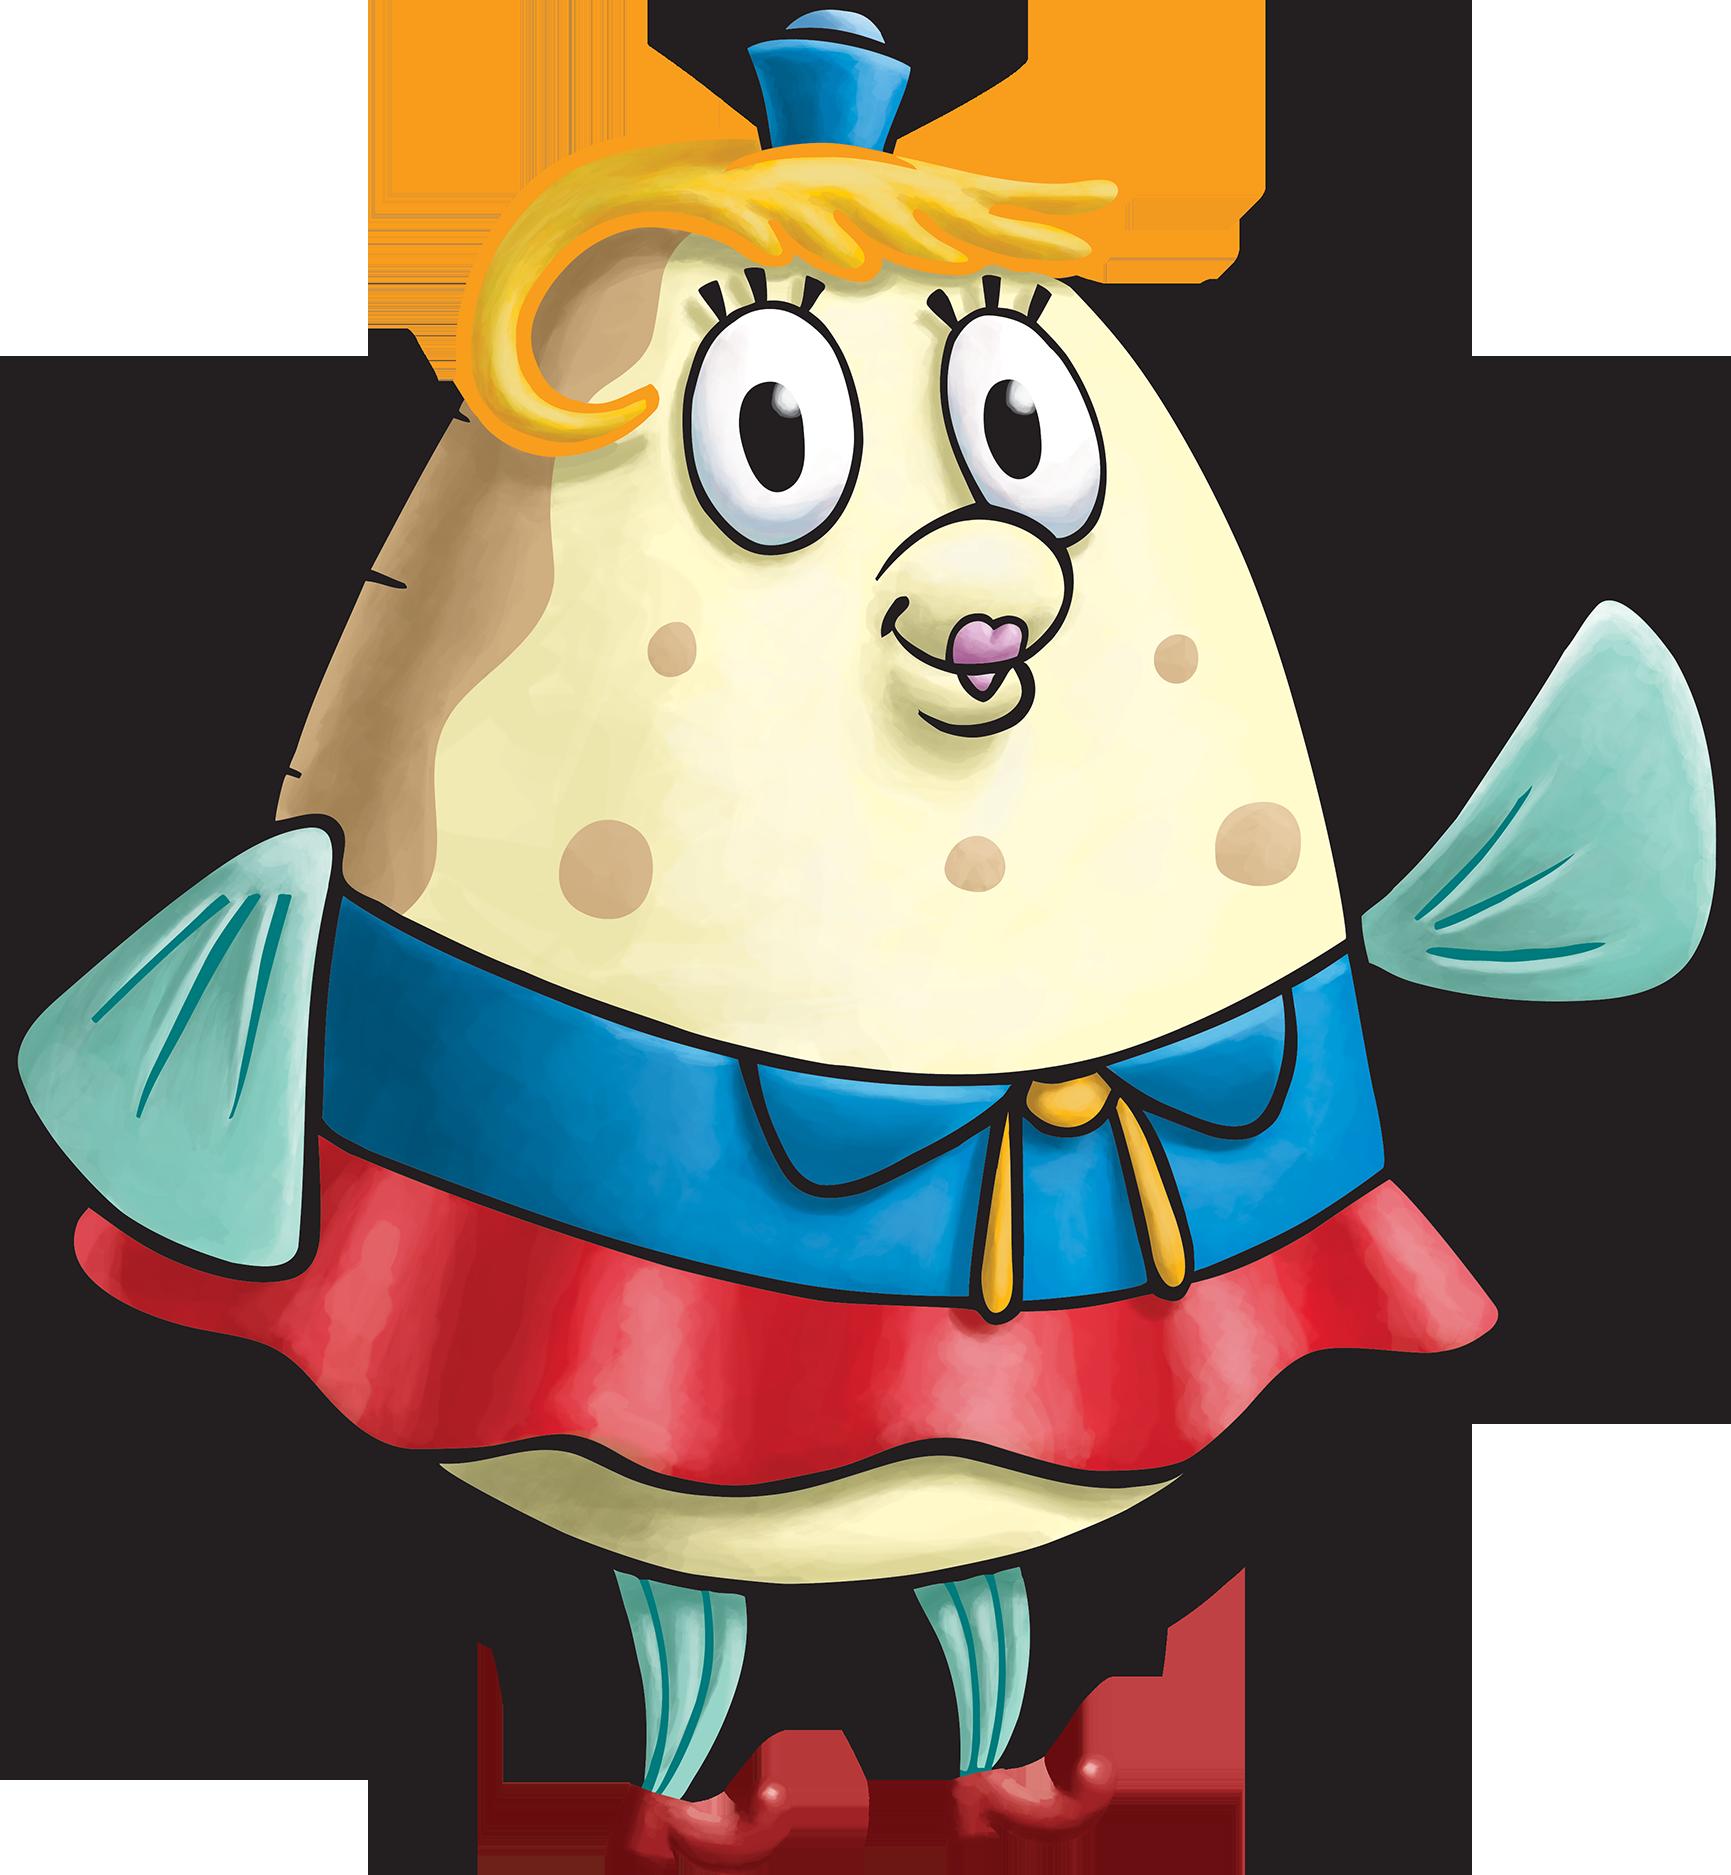 Name clipart character. Image spongebob squarepants mrs